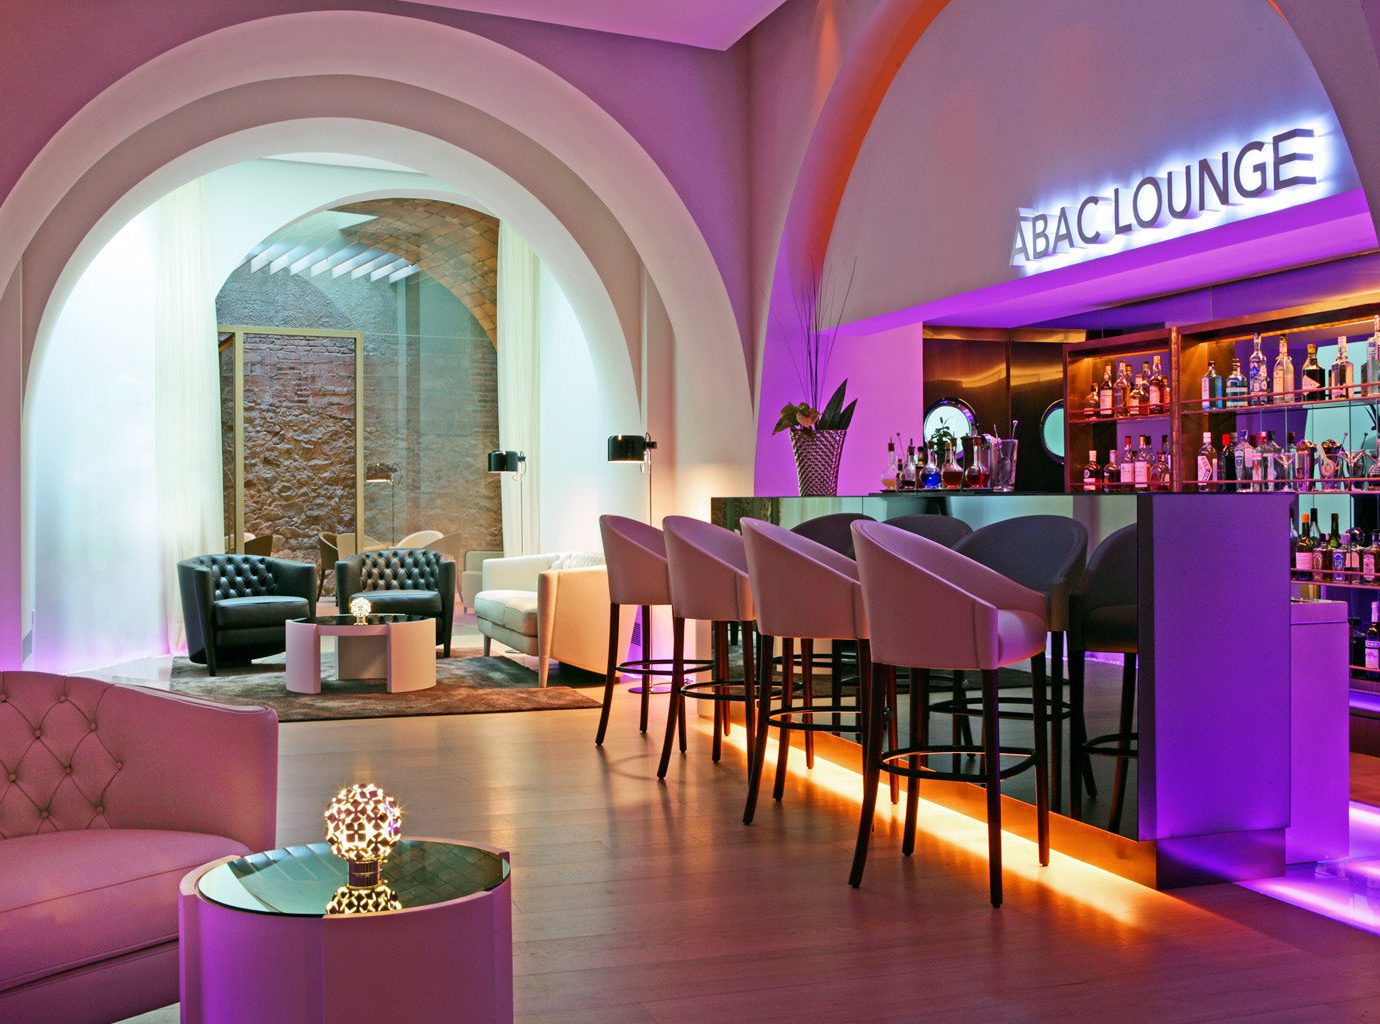 Bar Boutique Hotels Dining Drink Eat Hotels Lounge Modern indoor floor color room Lobby interior design restaurant pink function hall Resort estate purple decorated furniture